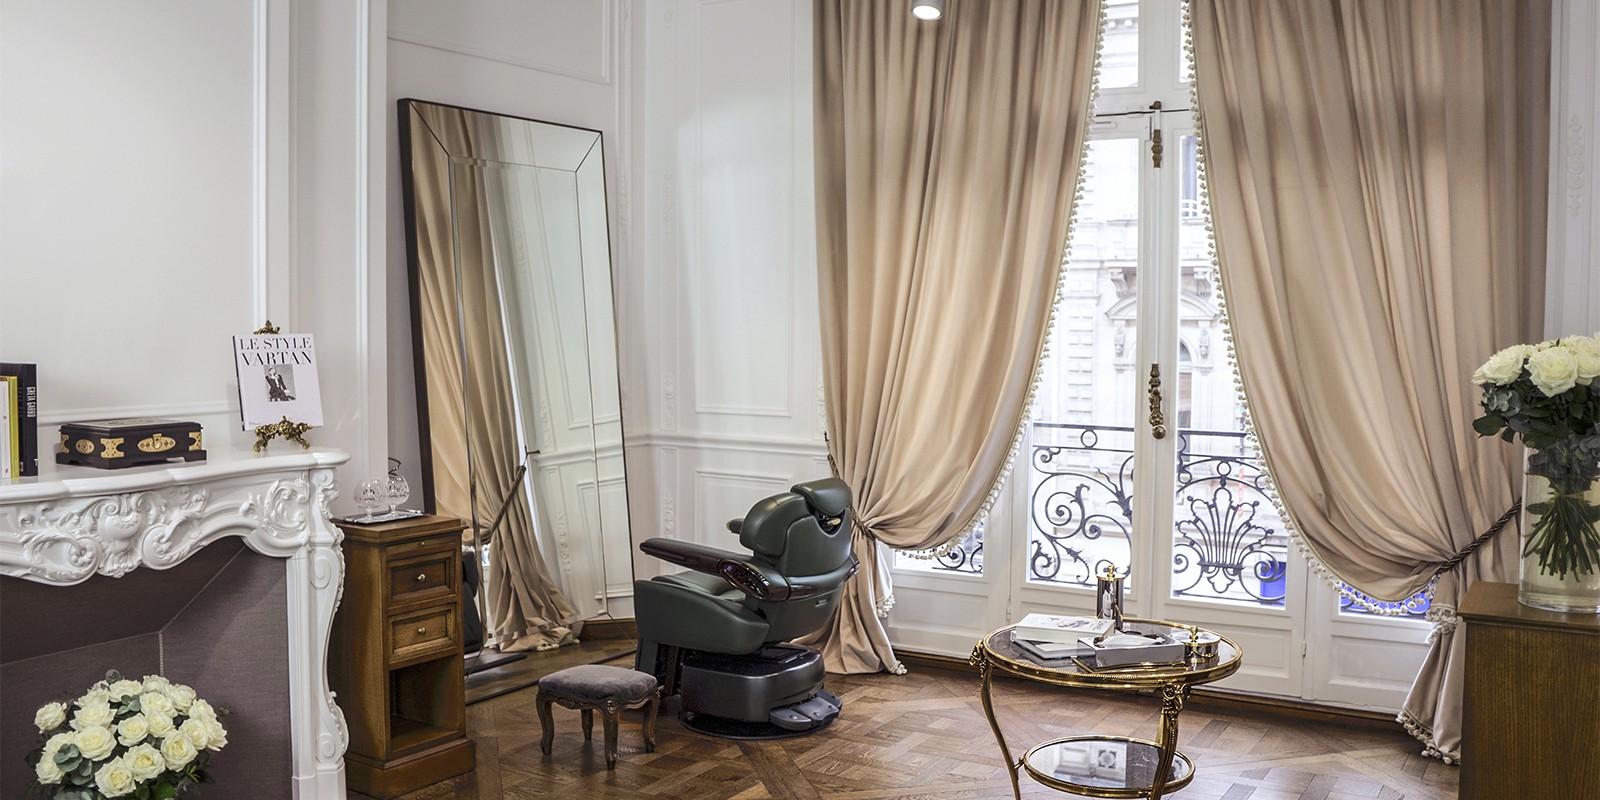 66e8094f0a41dd5381739a4cf0b3557b Salon A Paris @homecatalog.info